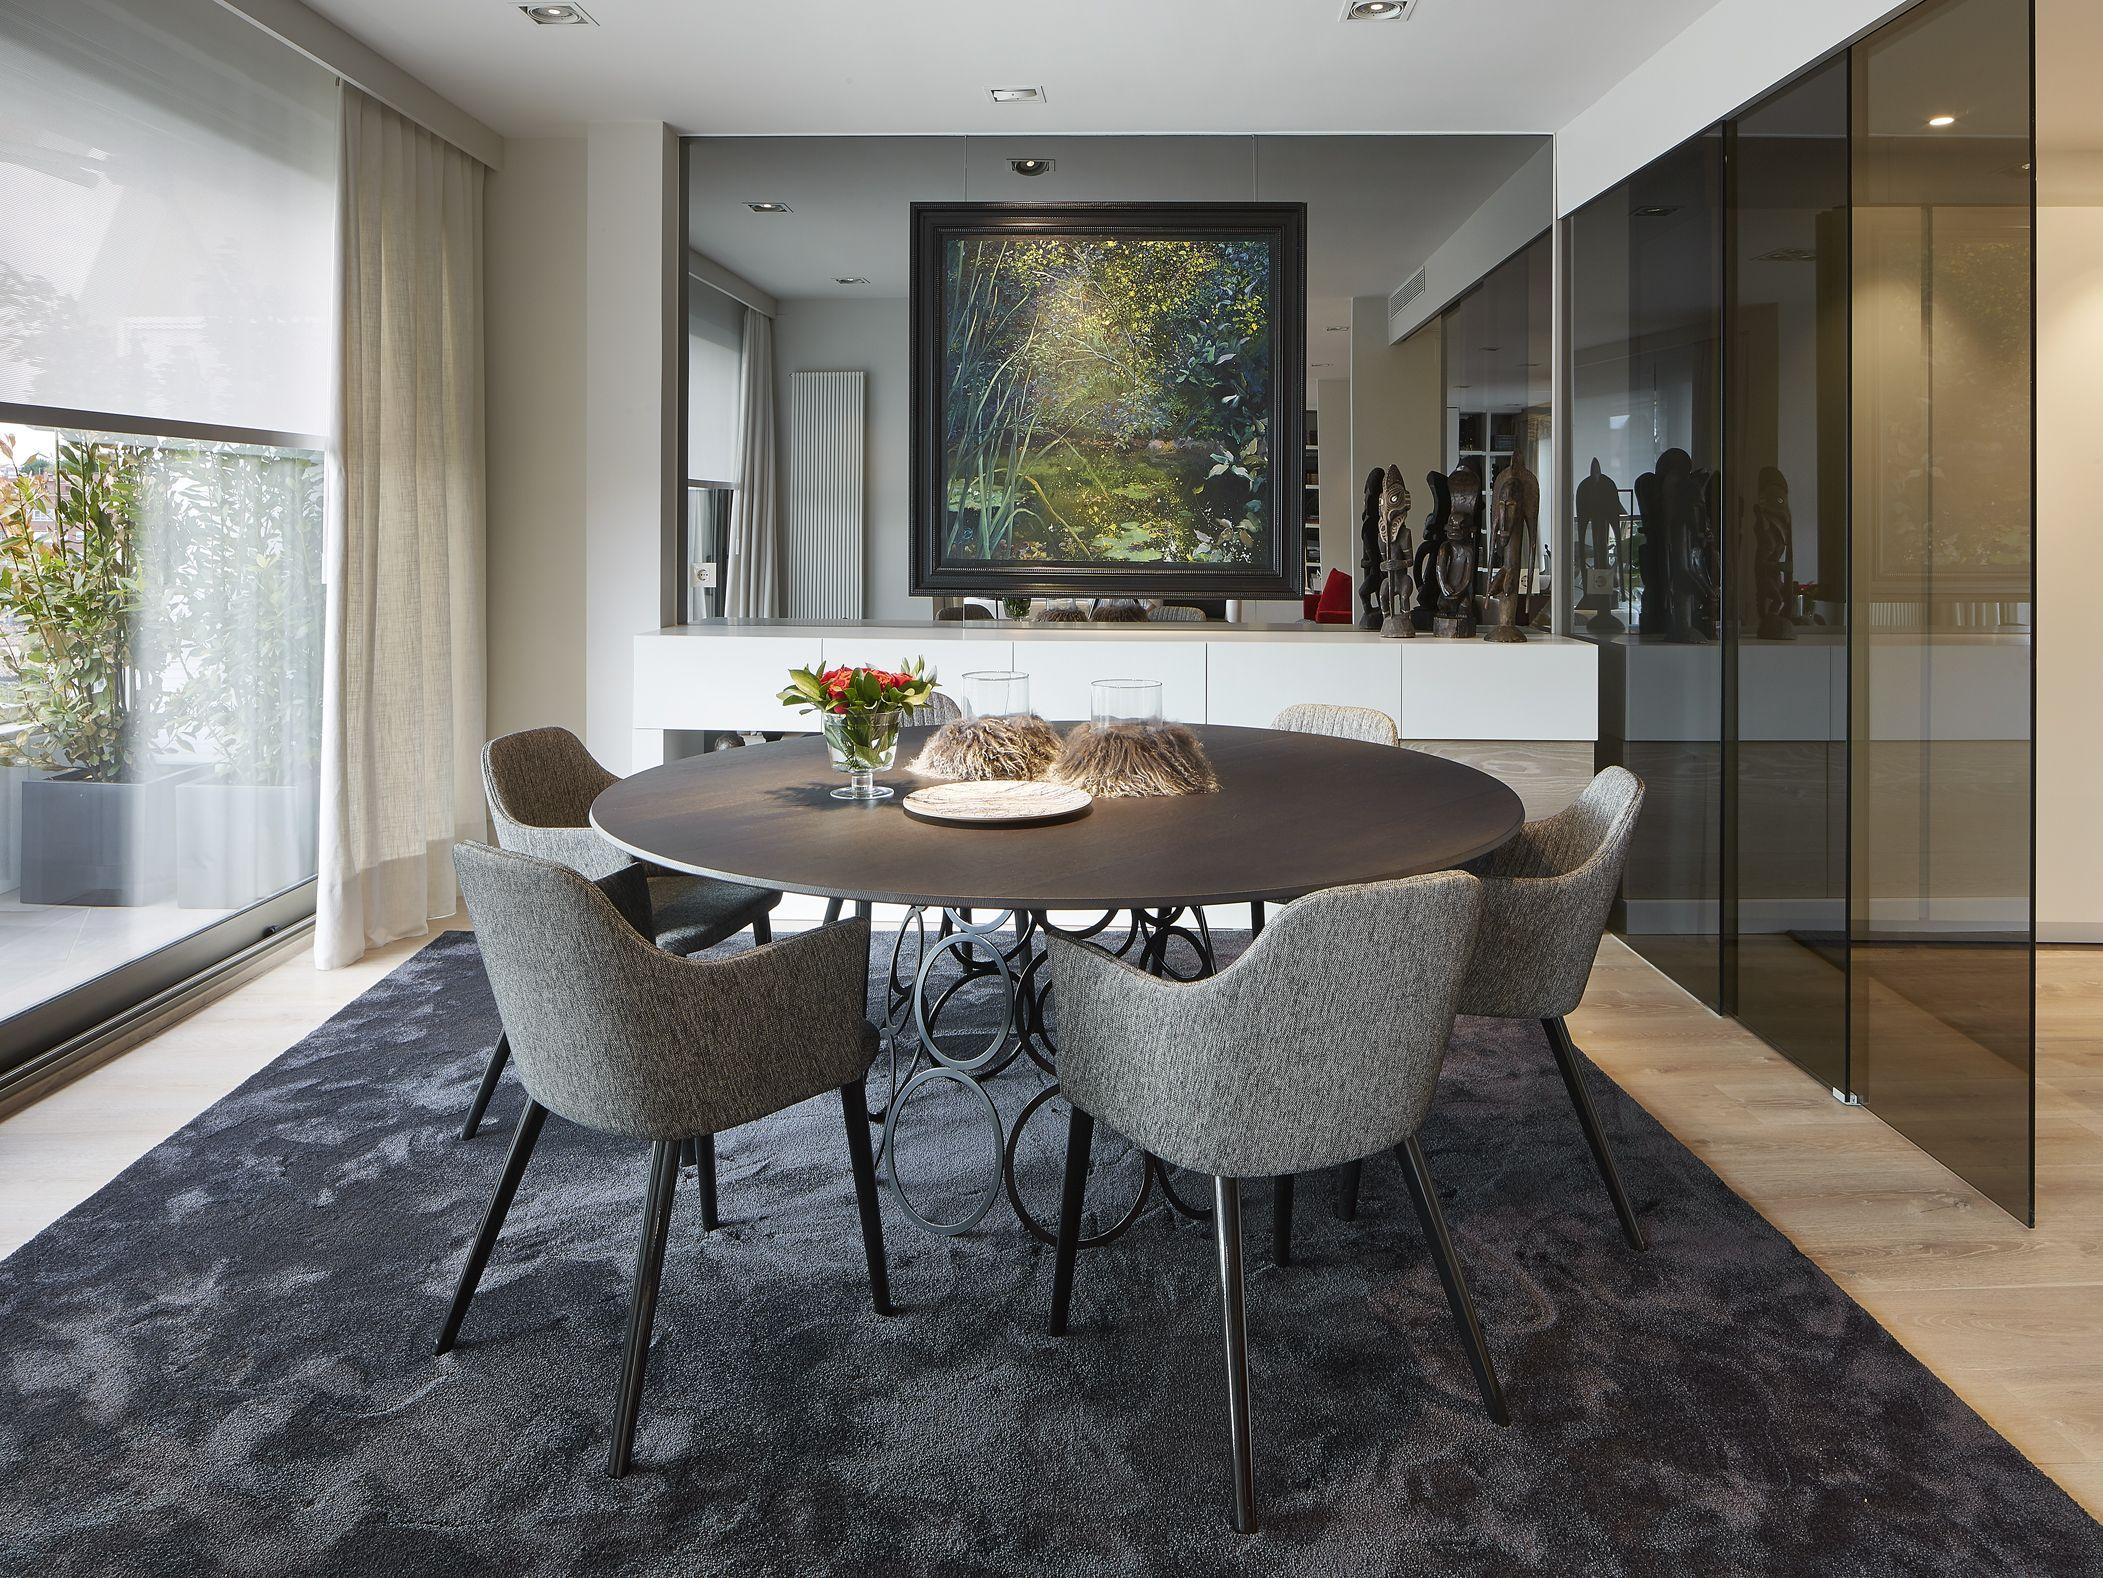 Molins interiors arquitectura interior interiorismo for Interiorismo contemporaneo